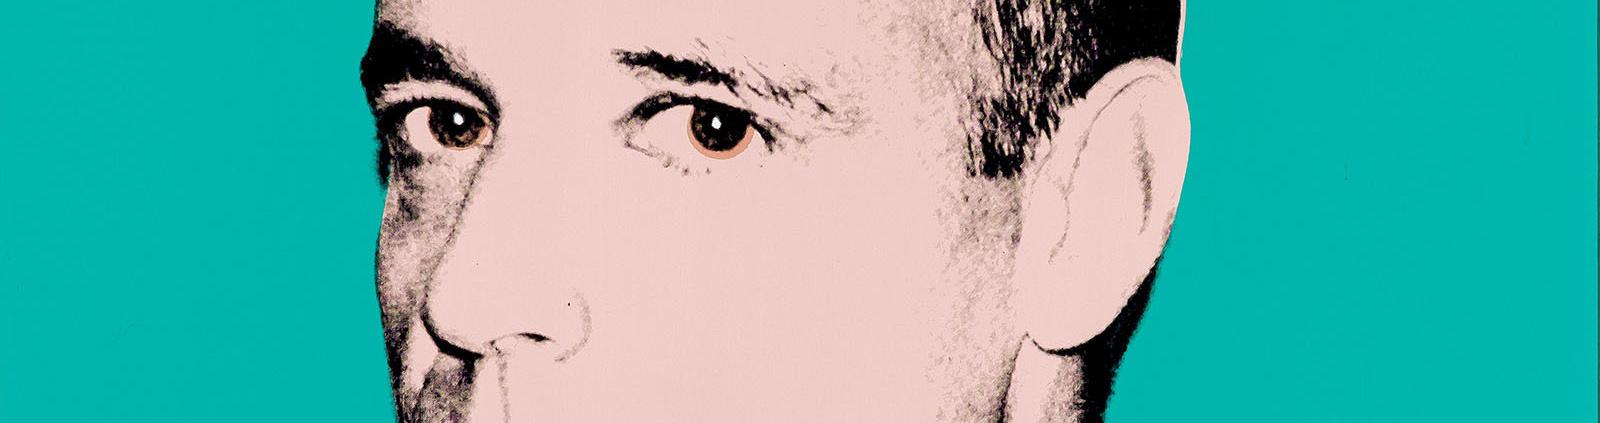 Andy Warhol. Portrait Oliver, 1980, detalle. Salida: 150.000 euros. No vendido